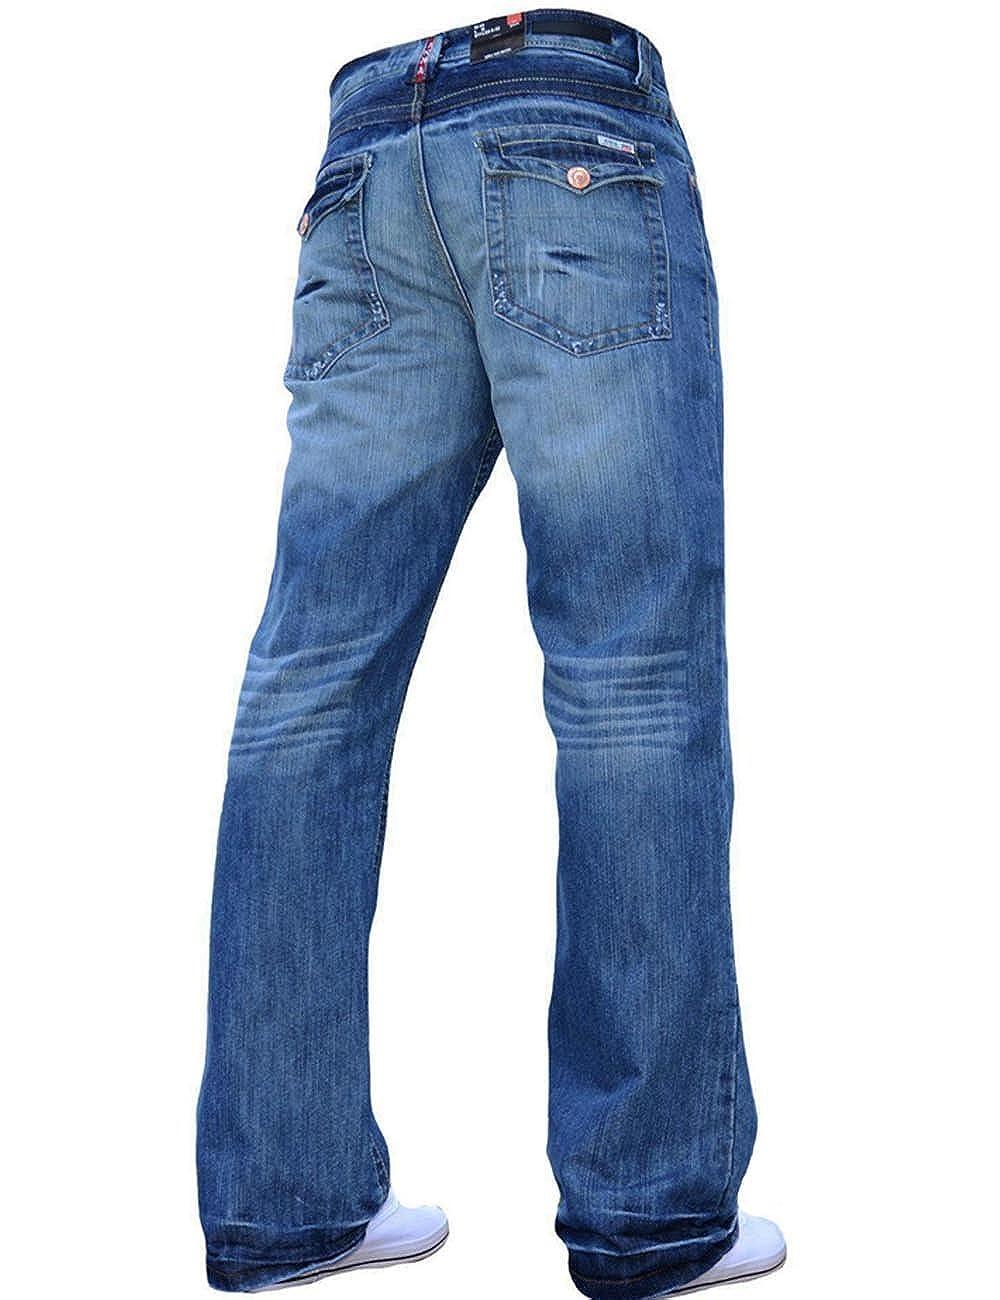 4eef7f2ef26 APT BNWT Mens Bootcut Flared Big King Size Wide Leg Blue Denim Jeans All  Waist  Amazon.co.uk  Clothing